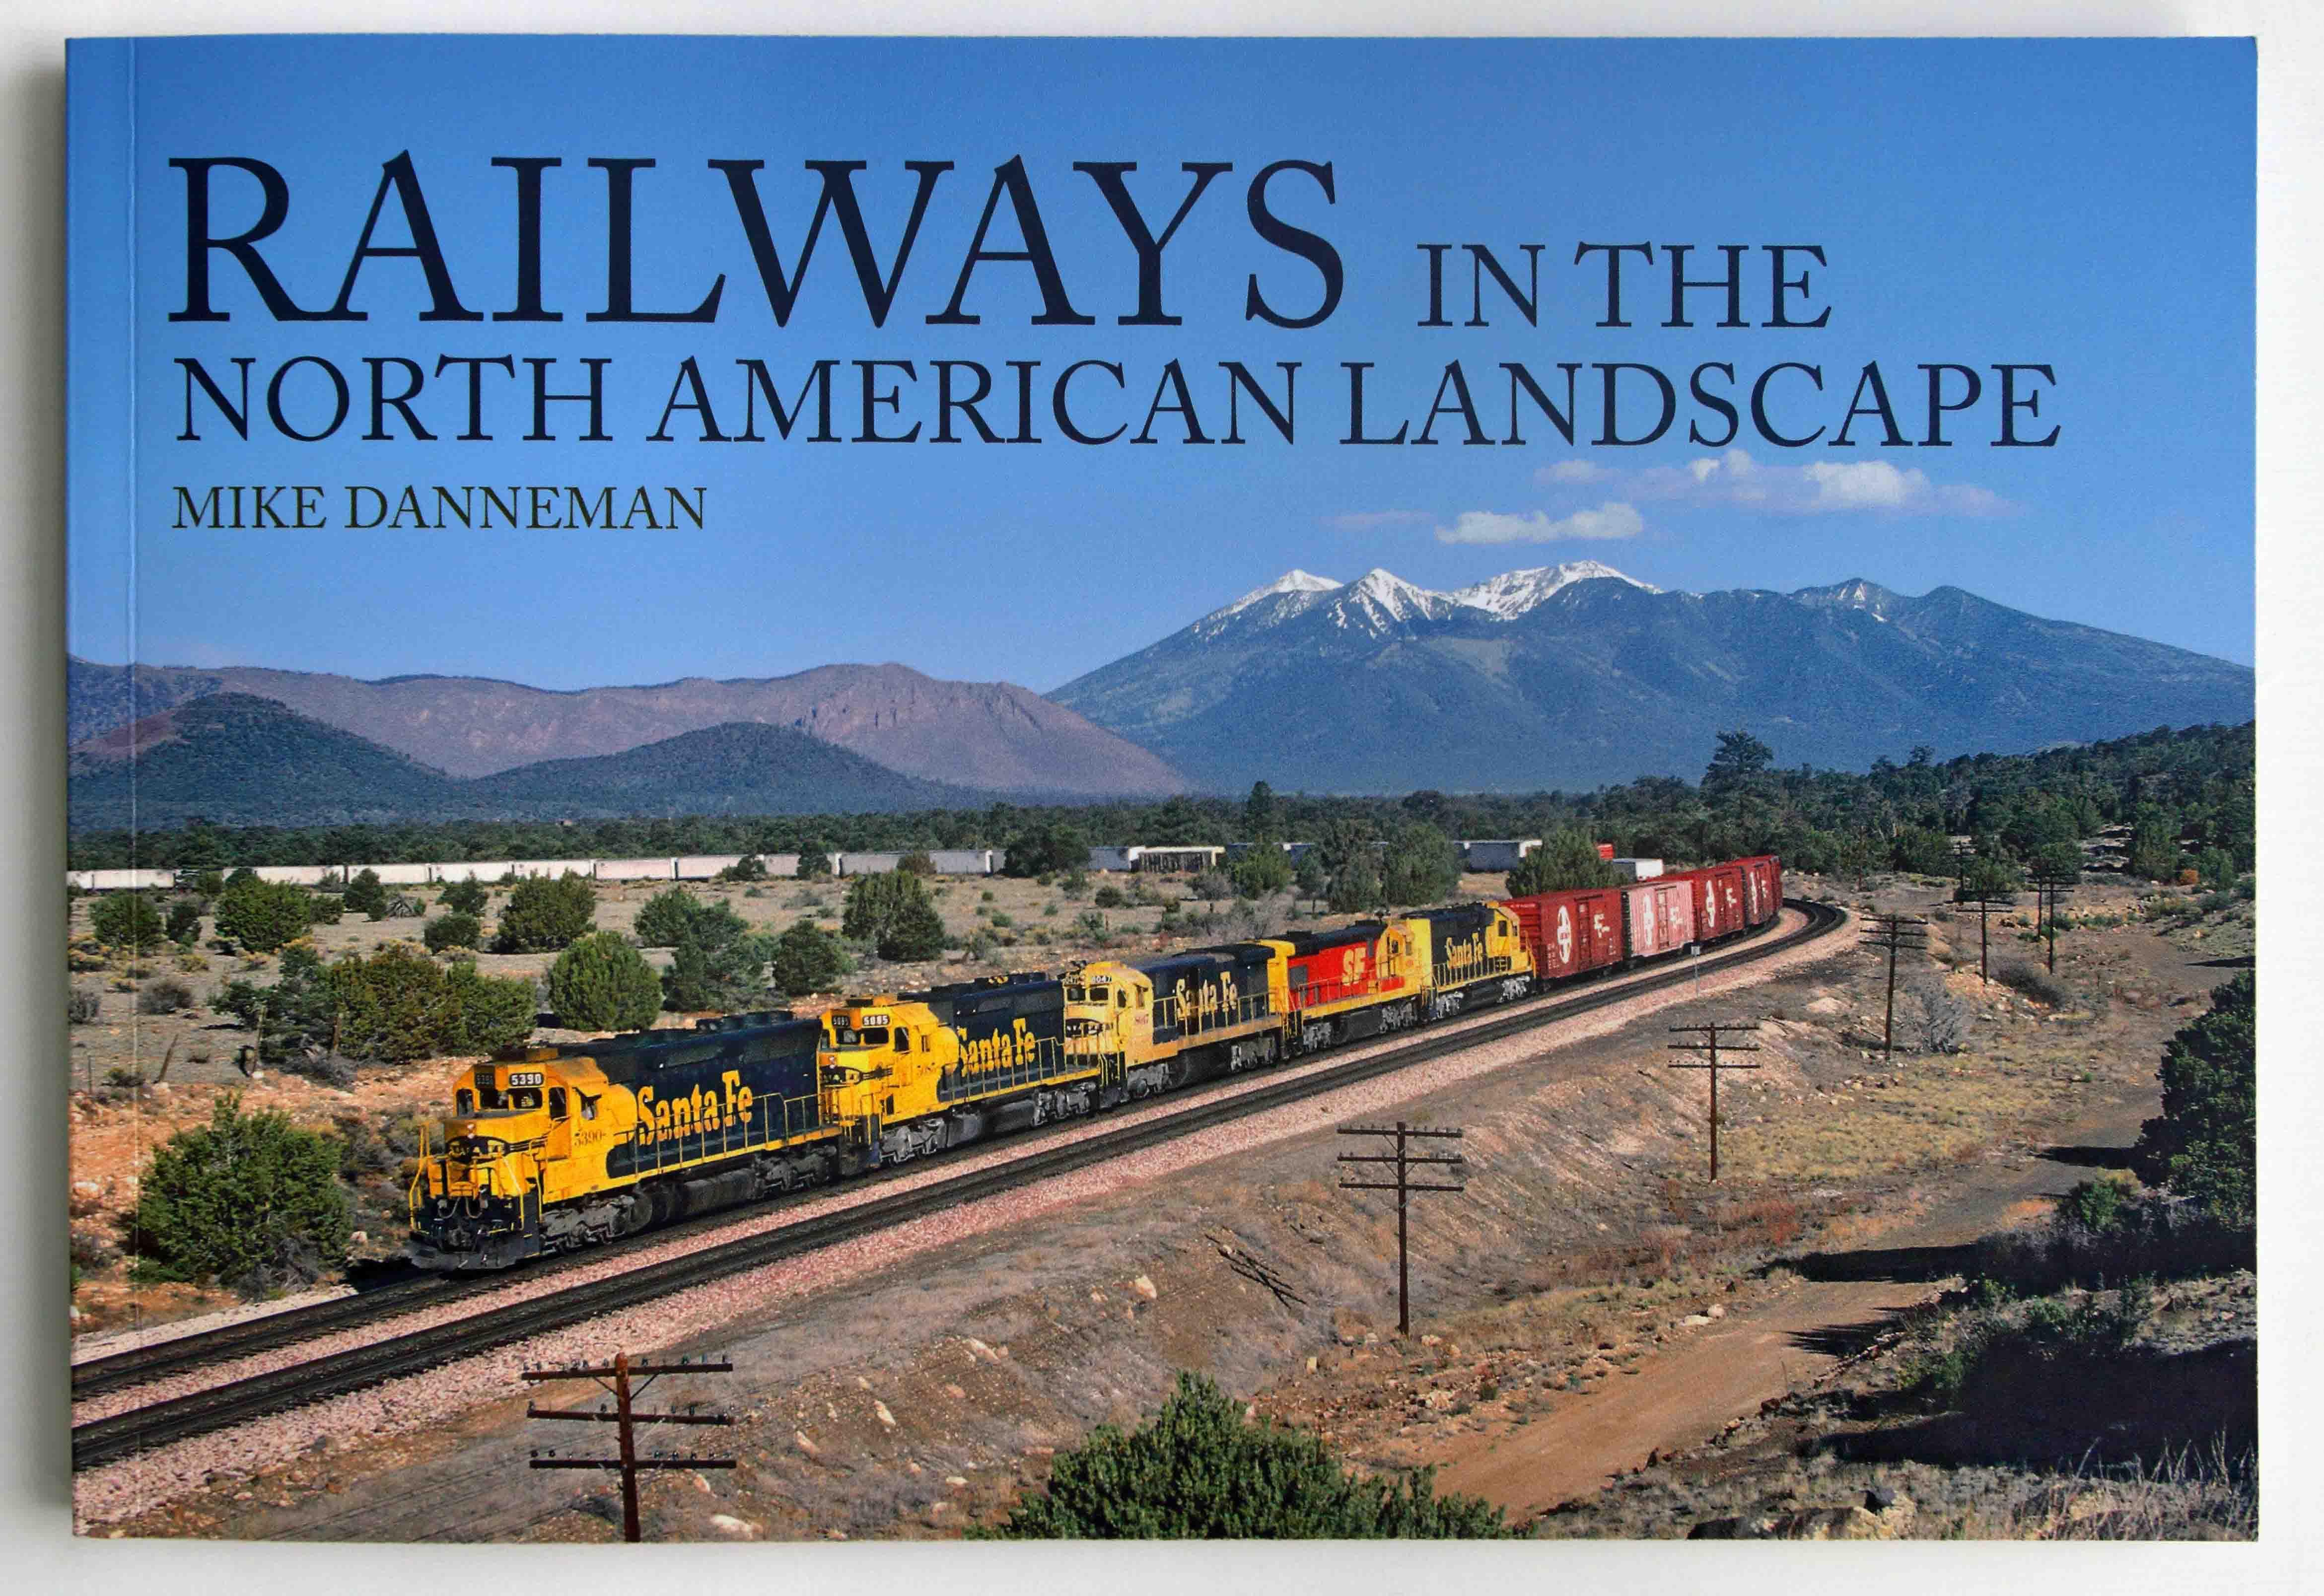 Mike-Danneman-Railways-in-the-North-American-Landscape